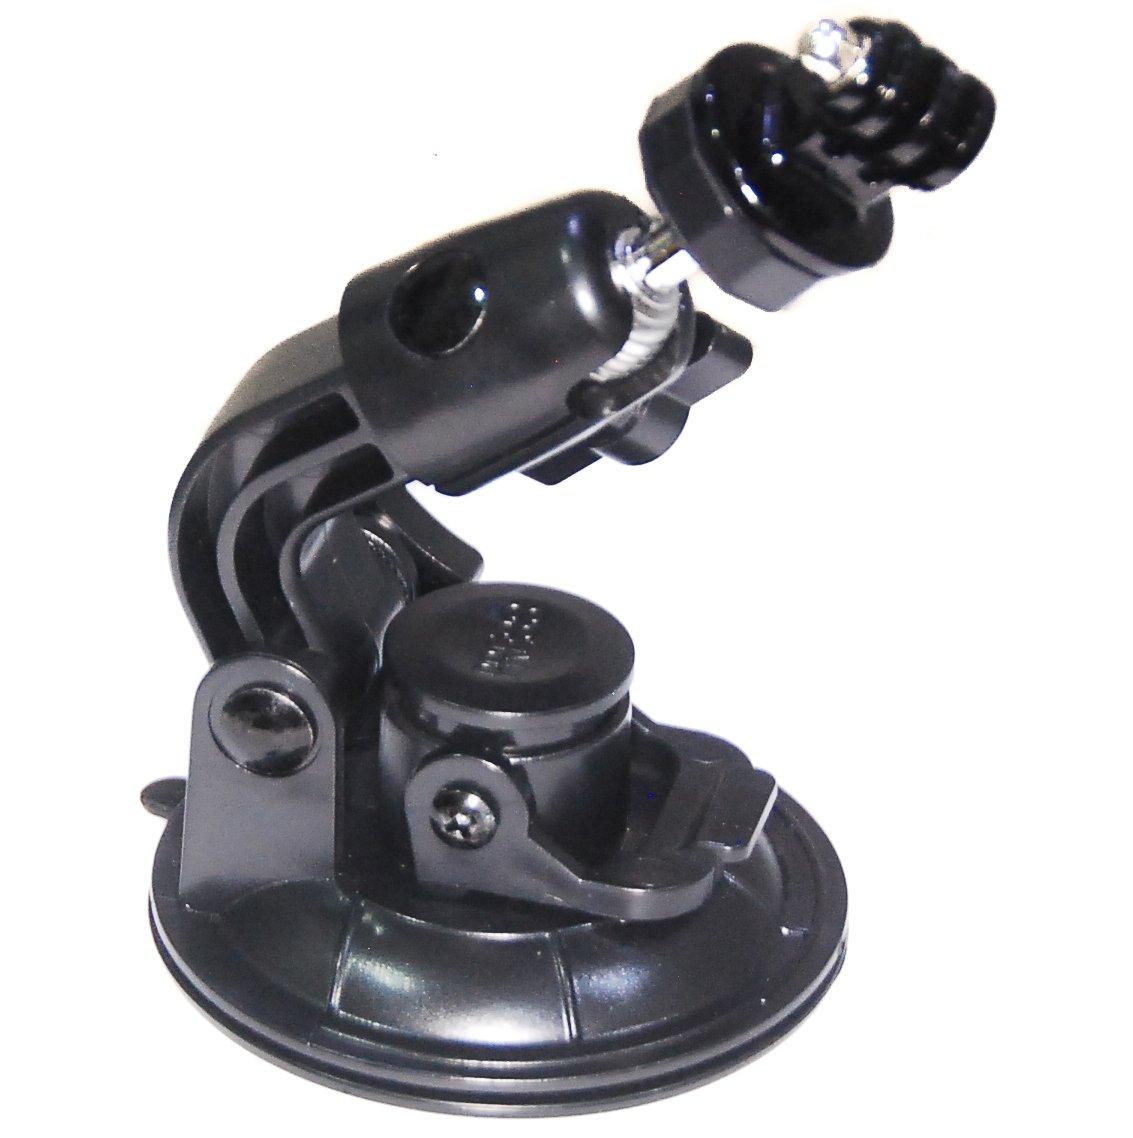 Protastic 9cm ventosa per GoPro Hero fotocamere e videocamere SJCAM PROtastic.co.uk 1031